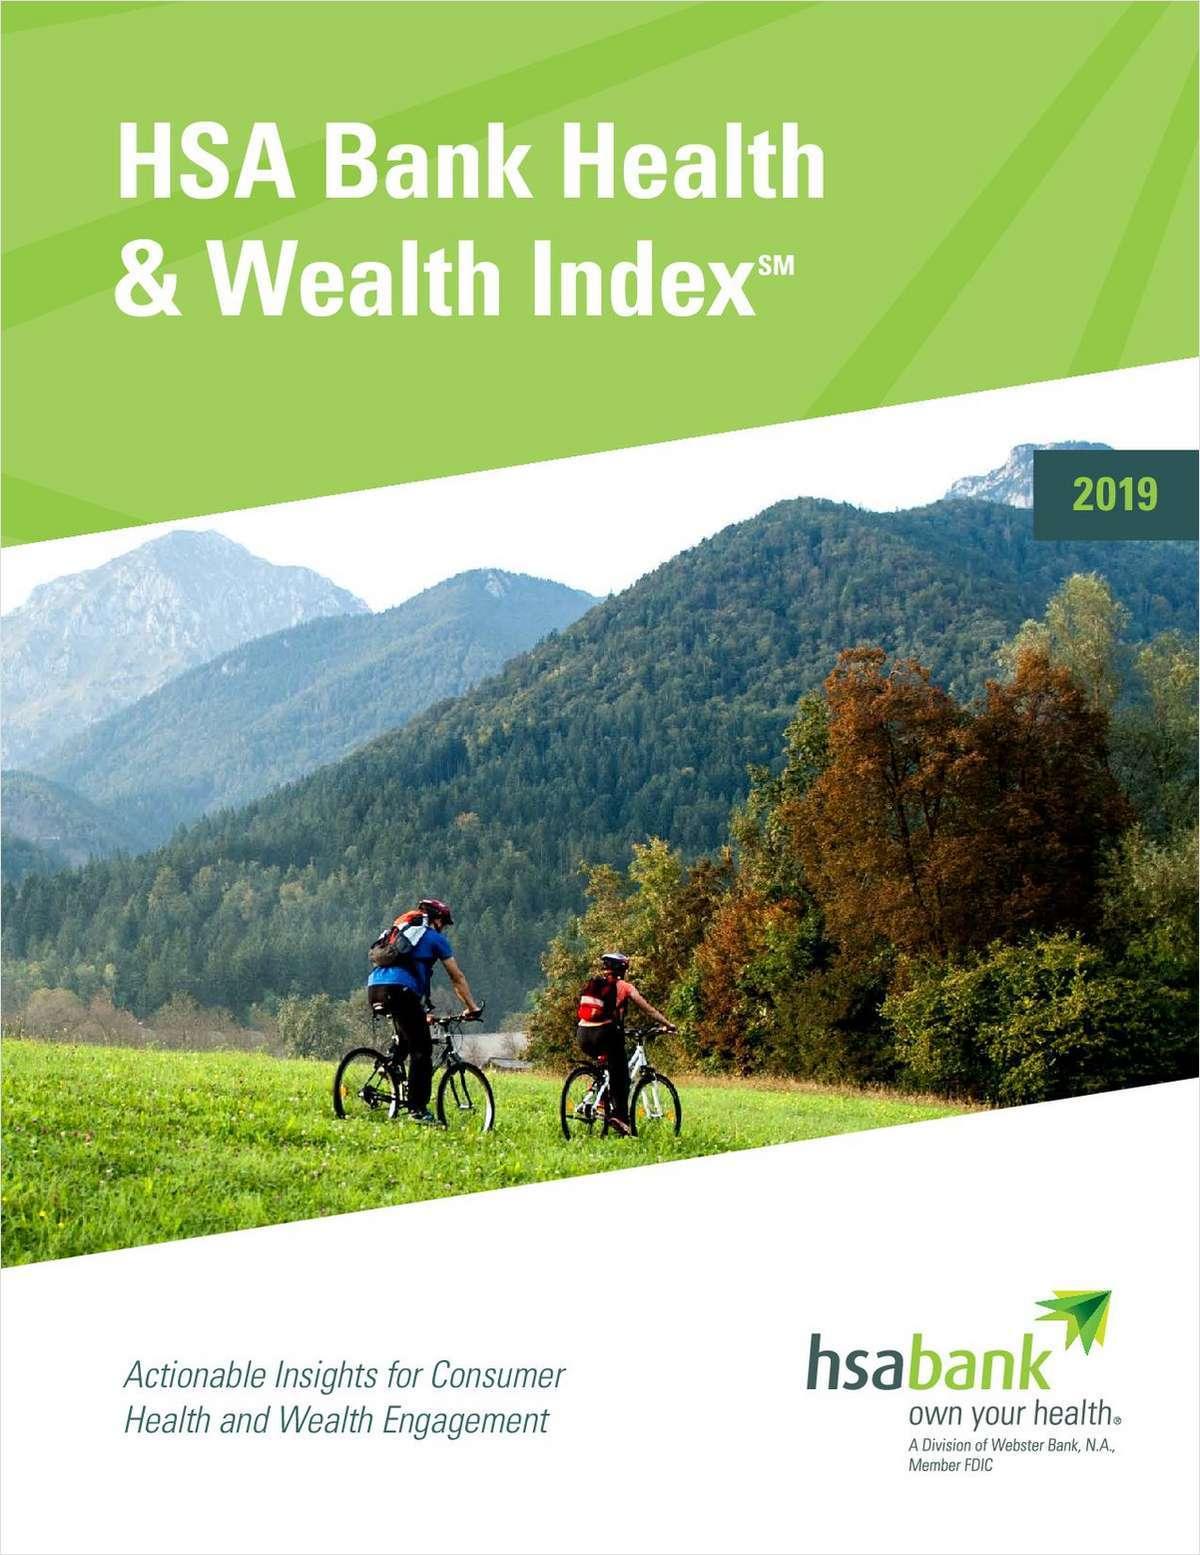 2019 HSA Bank Health & Wealth Index℠ Report - Paperpicks